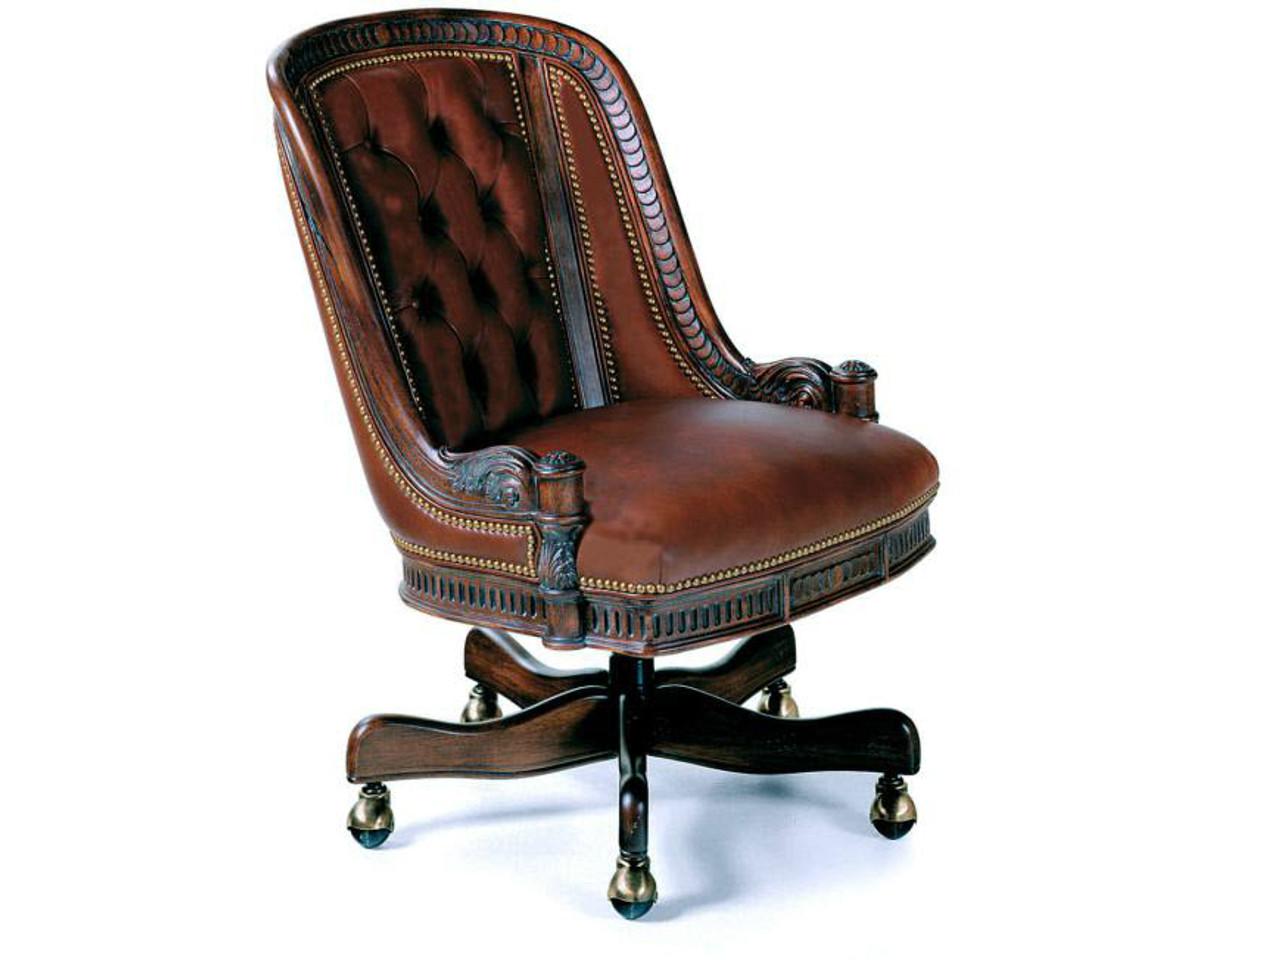 hudson tufted executive chair